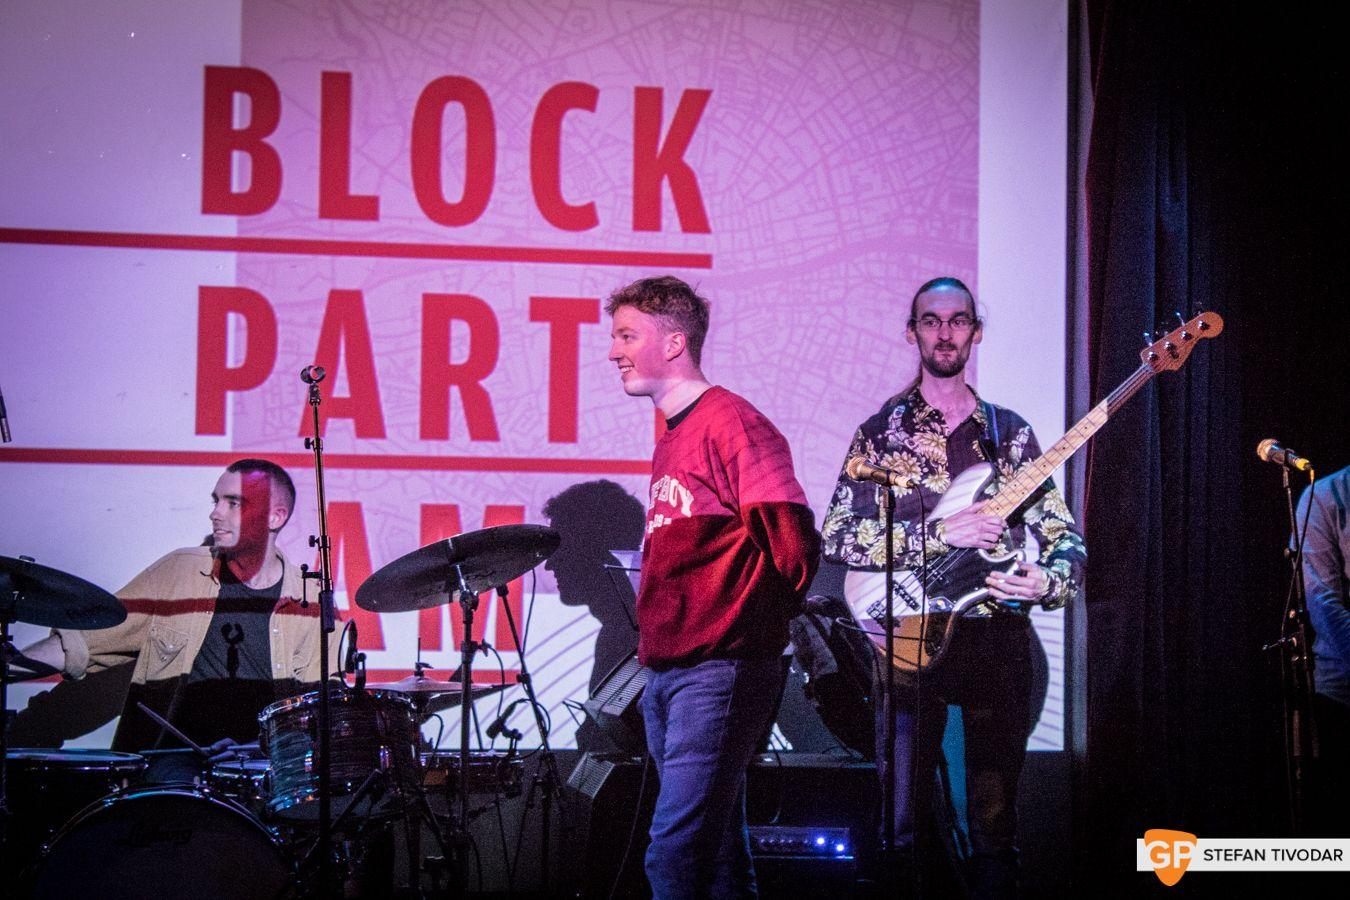 Kean Kavanagh GoldenPlec Bloc Party Jam 2018 Sugar Club 1